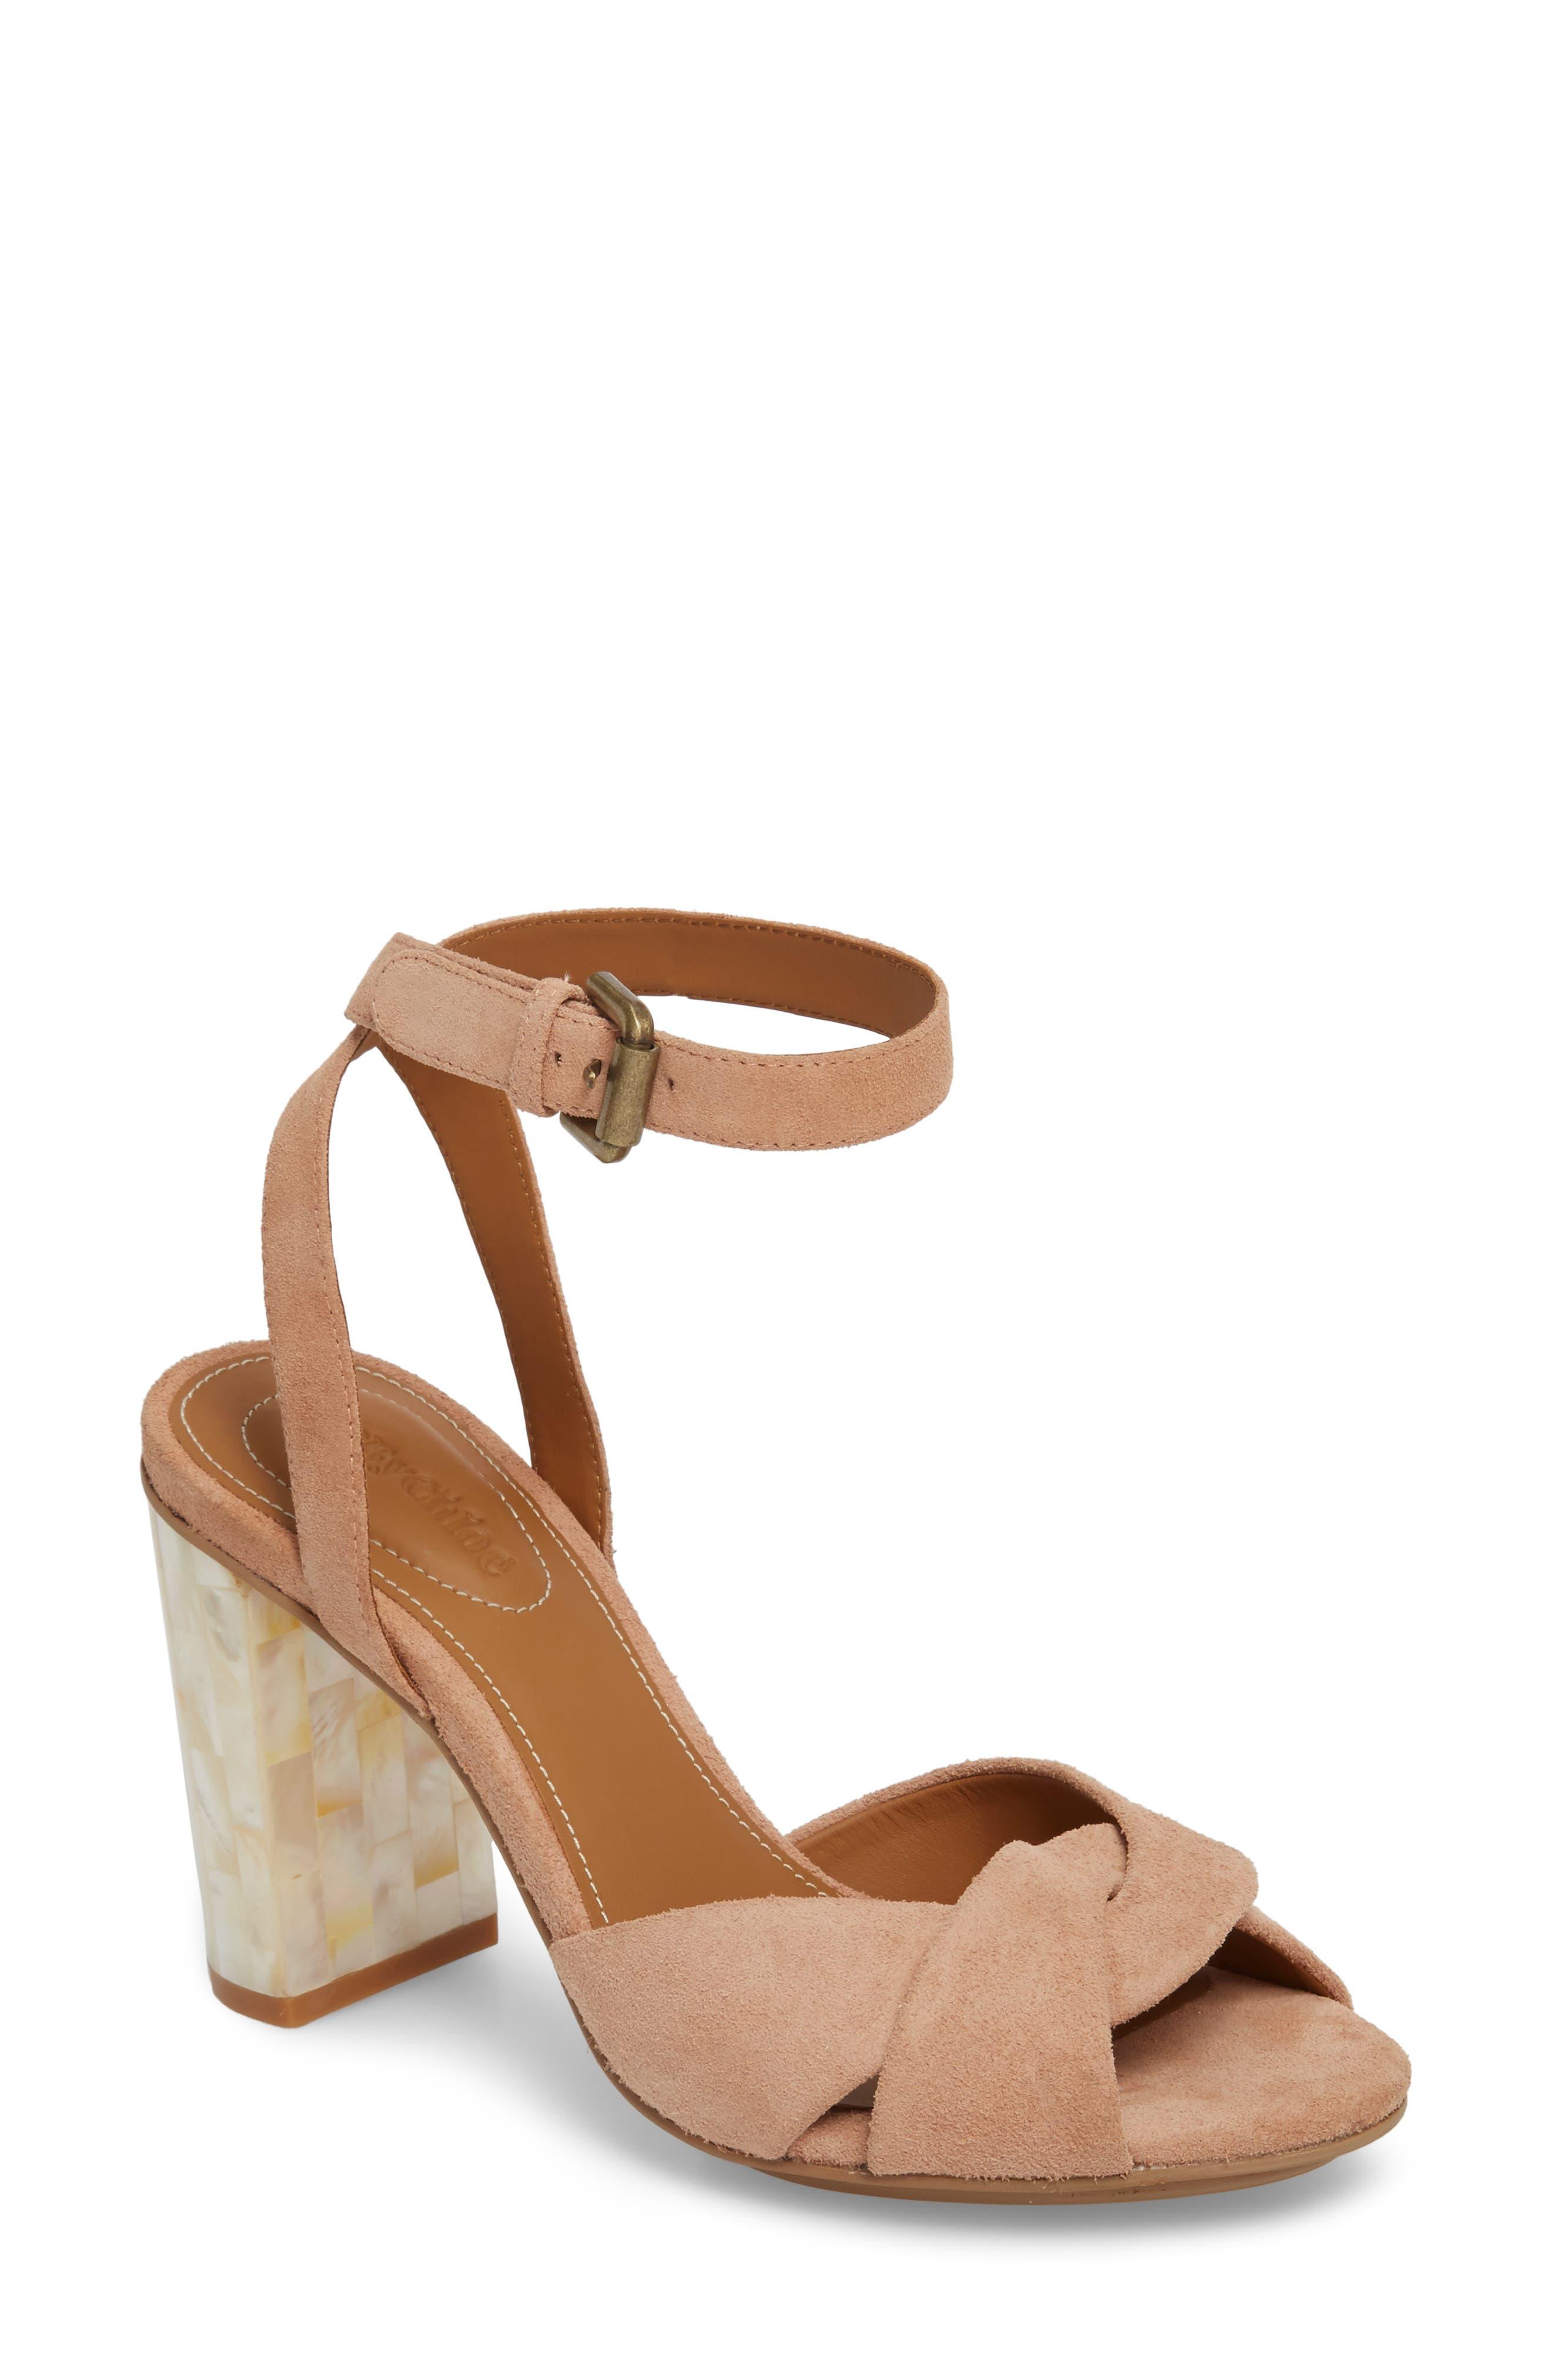 Isida Block Heel Sandal,                         Main,                         color, Cipria